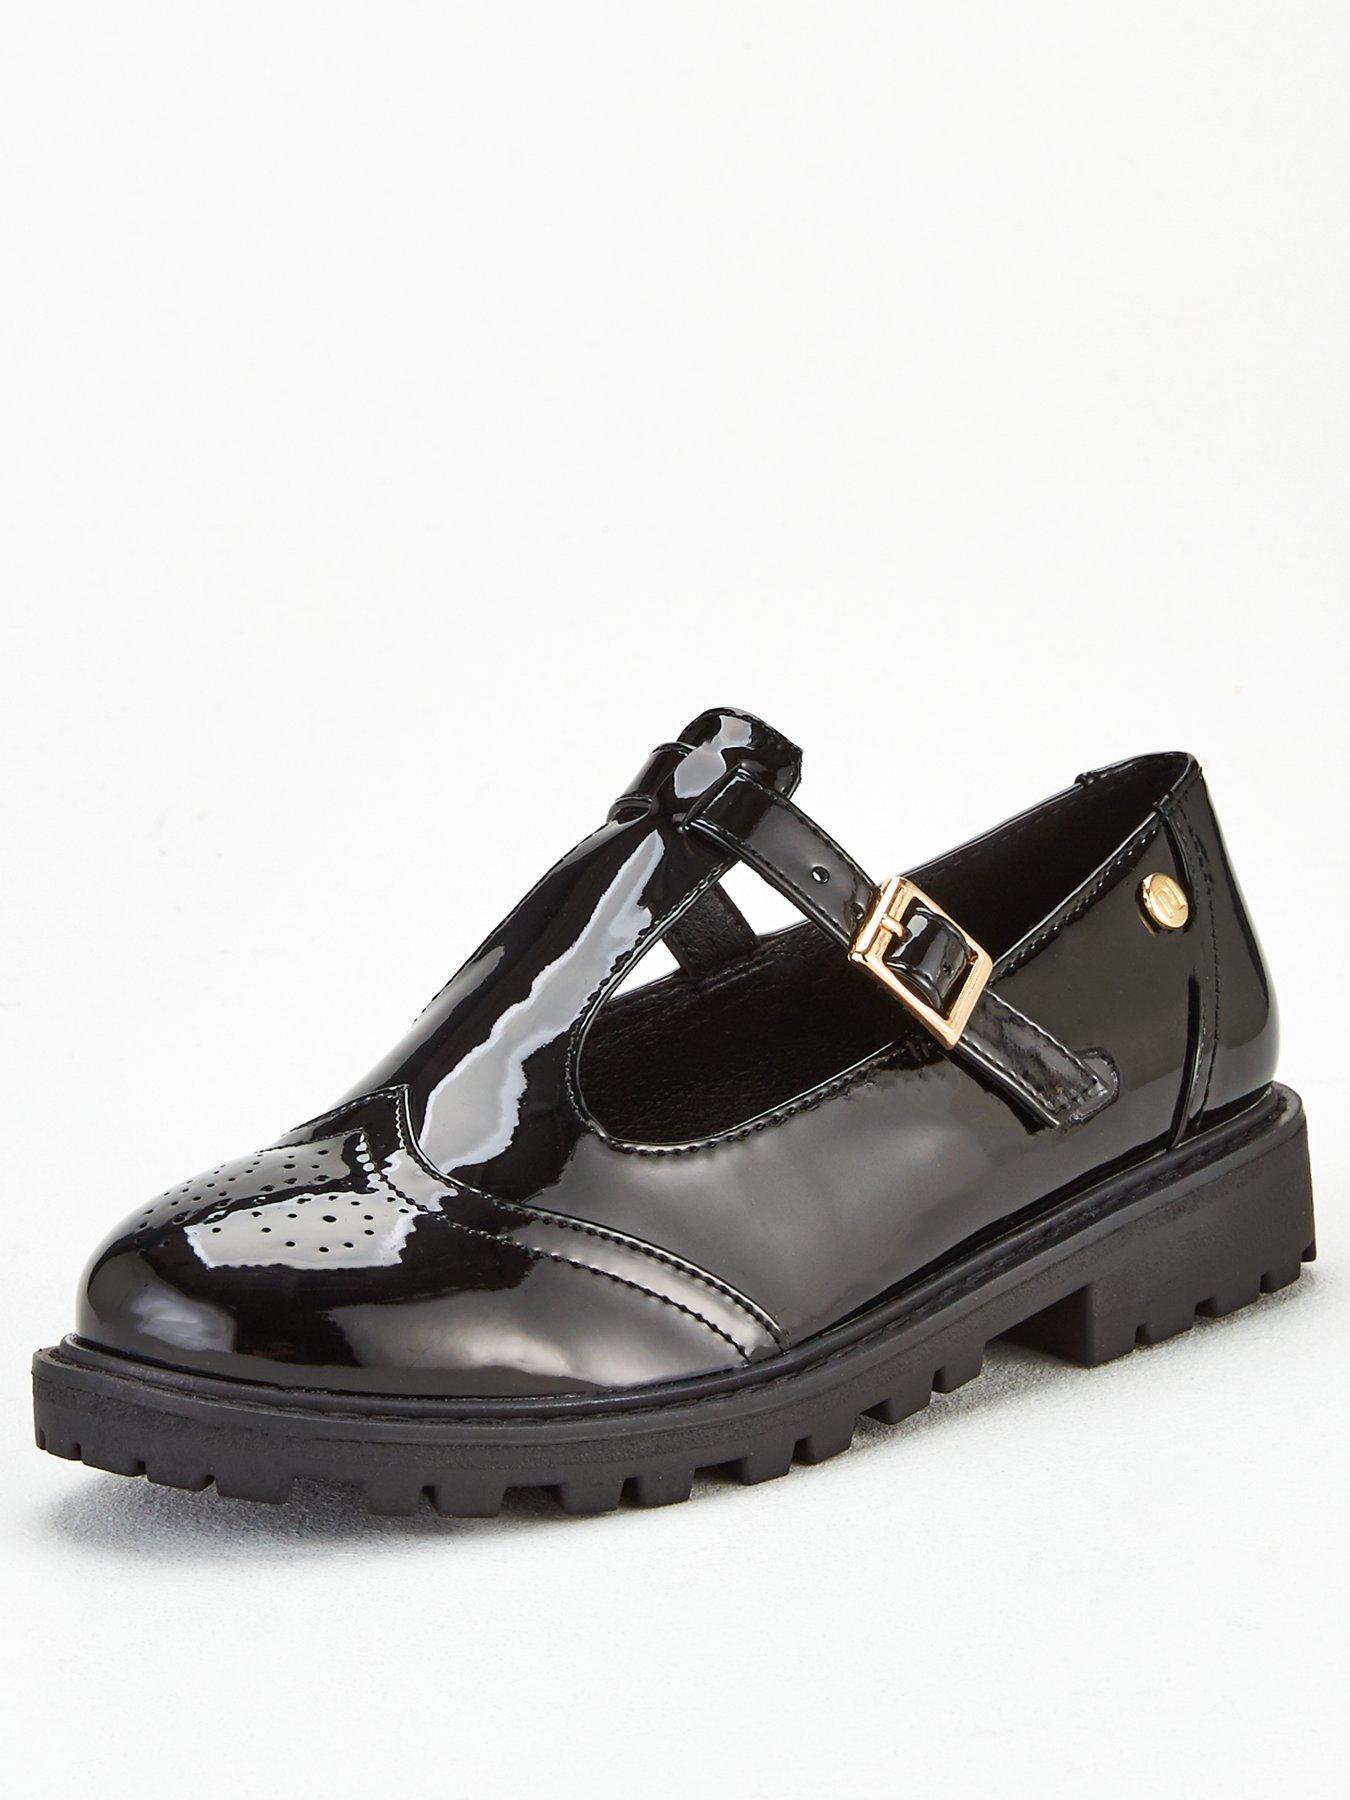 Kids Shoes | River Island Kids Boots